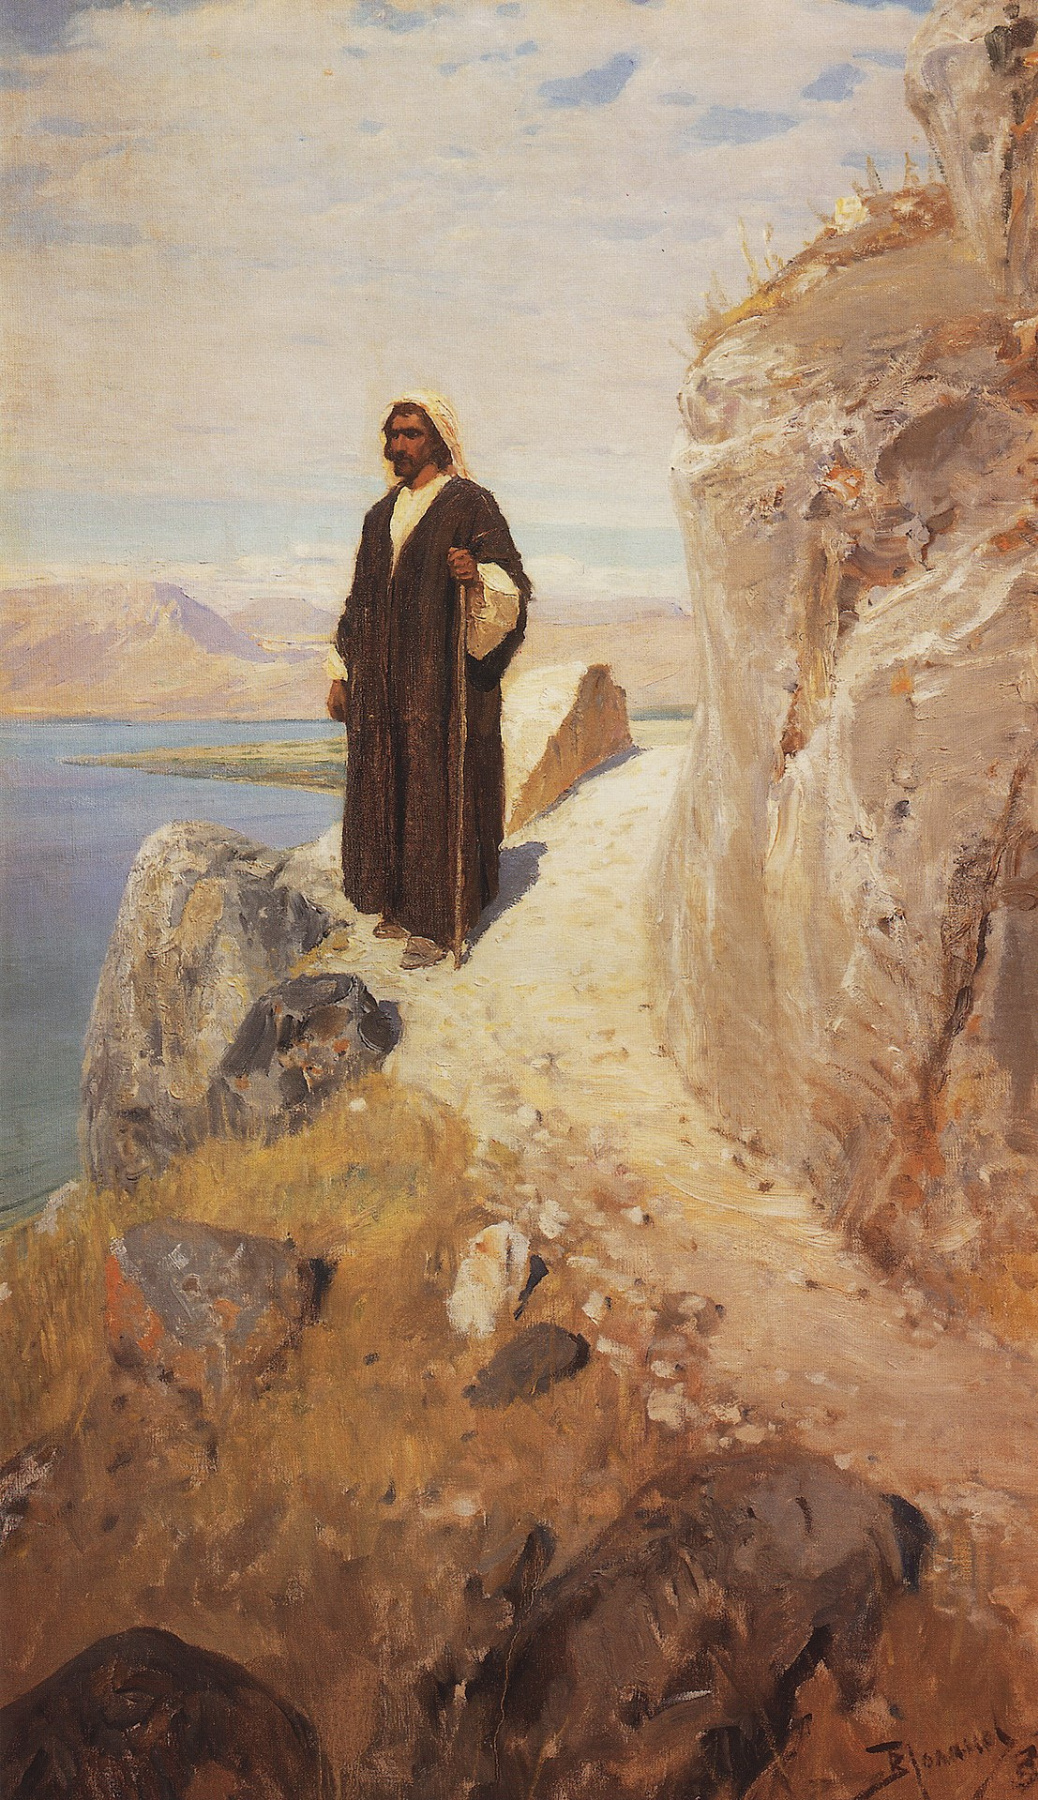 Vasily Dmitrievich Polenov. Returned to Galilee in fortitude